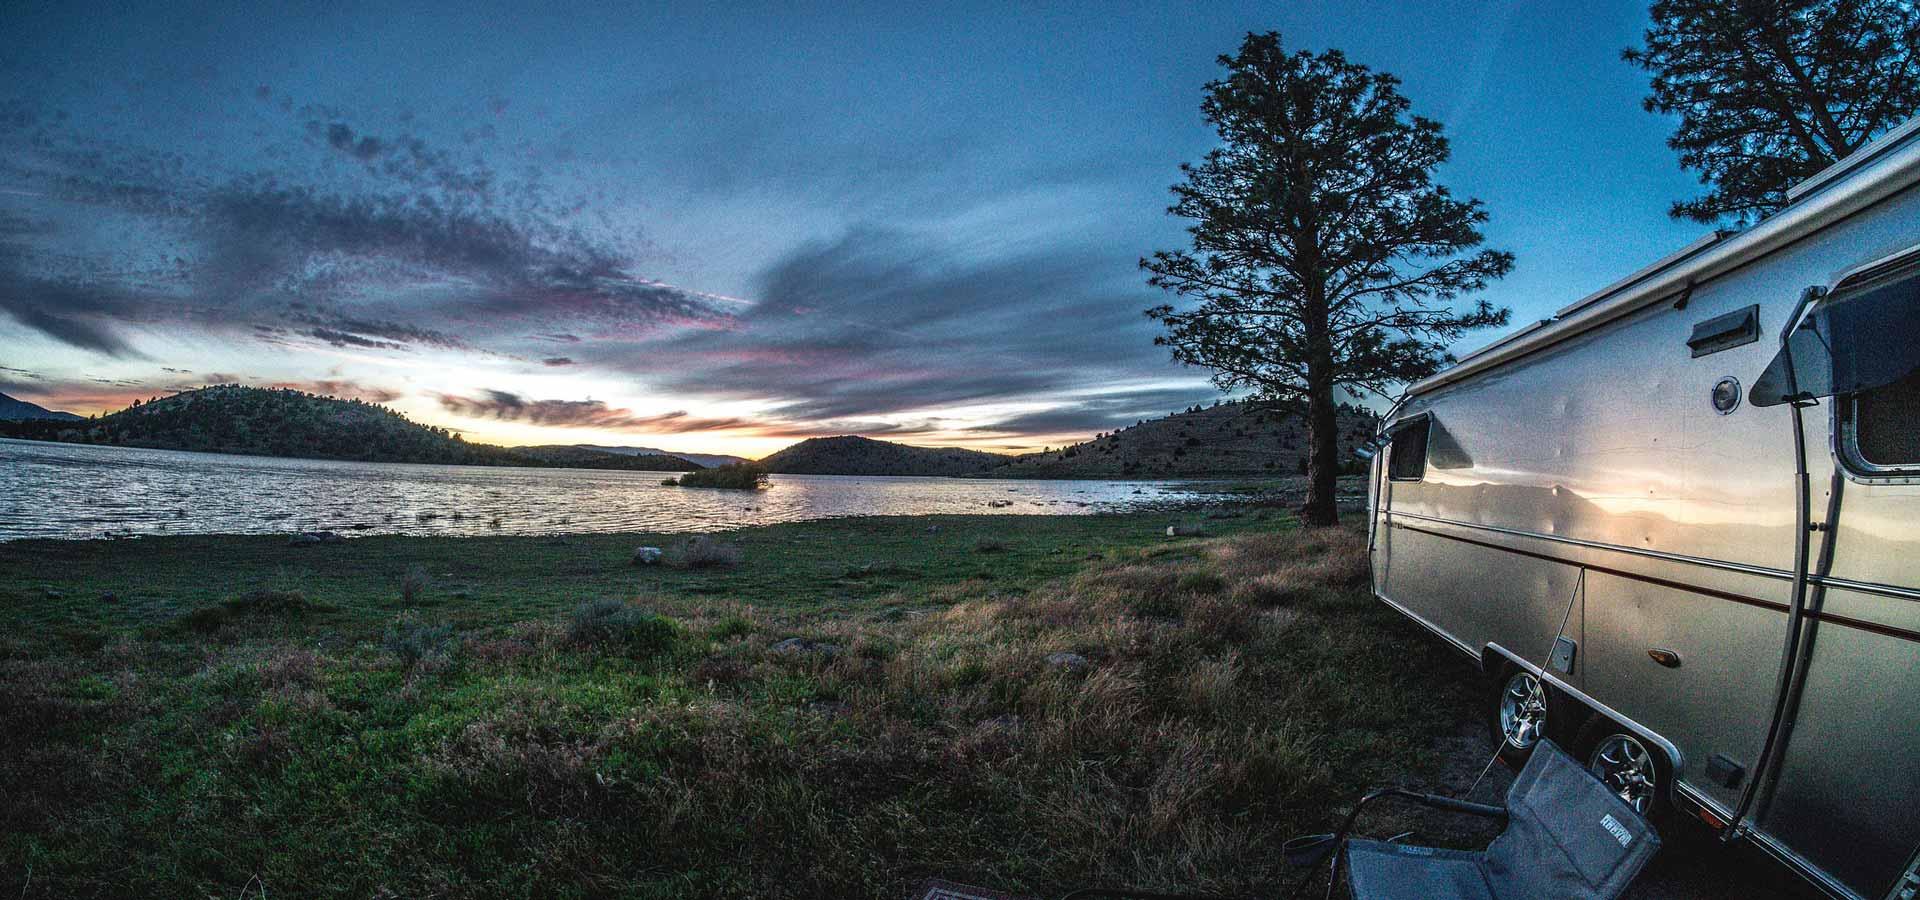 Camper am Seeufer im Sonnenuntergang